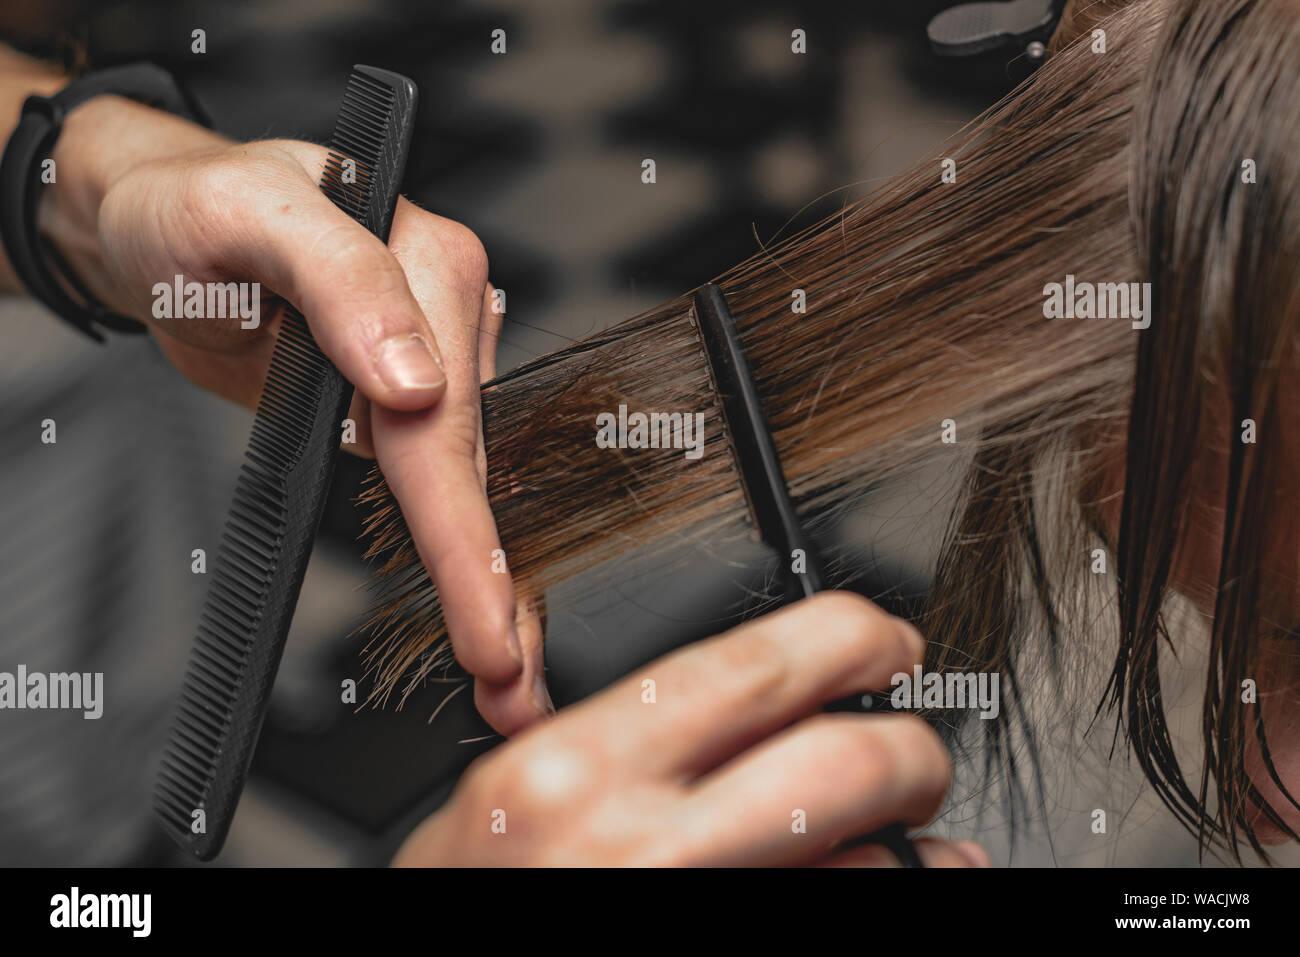 Woman Barber Shaving Man In Stock Photos & Woman Barber